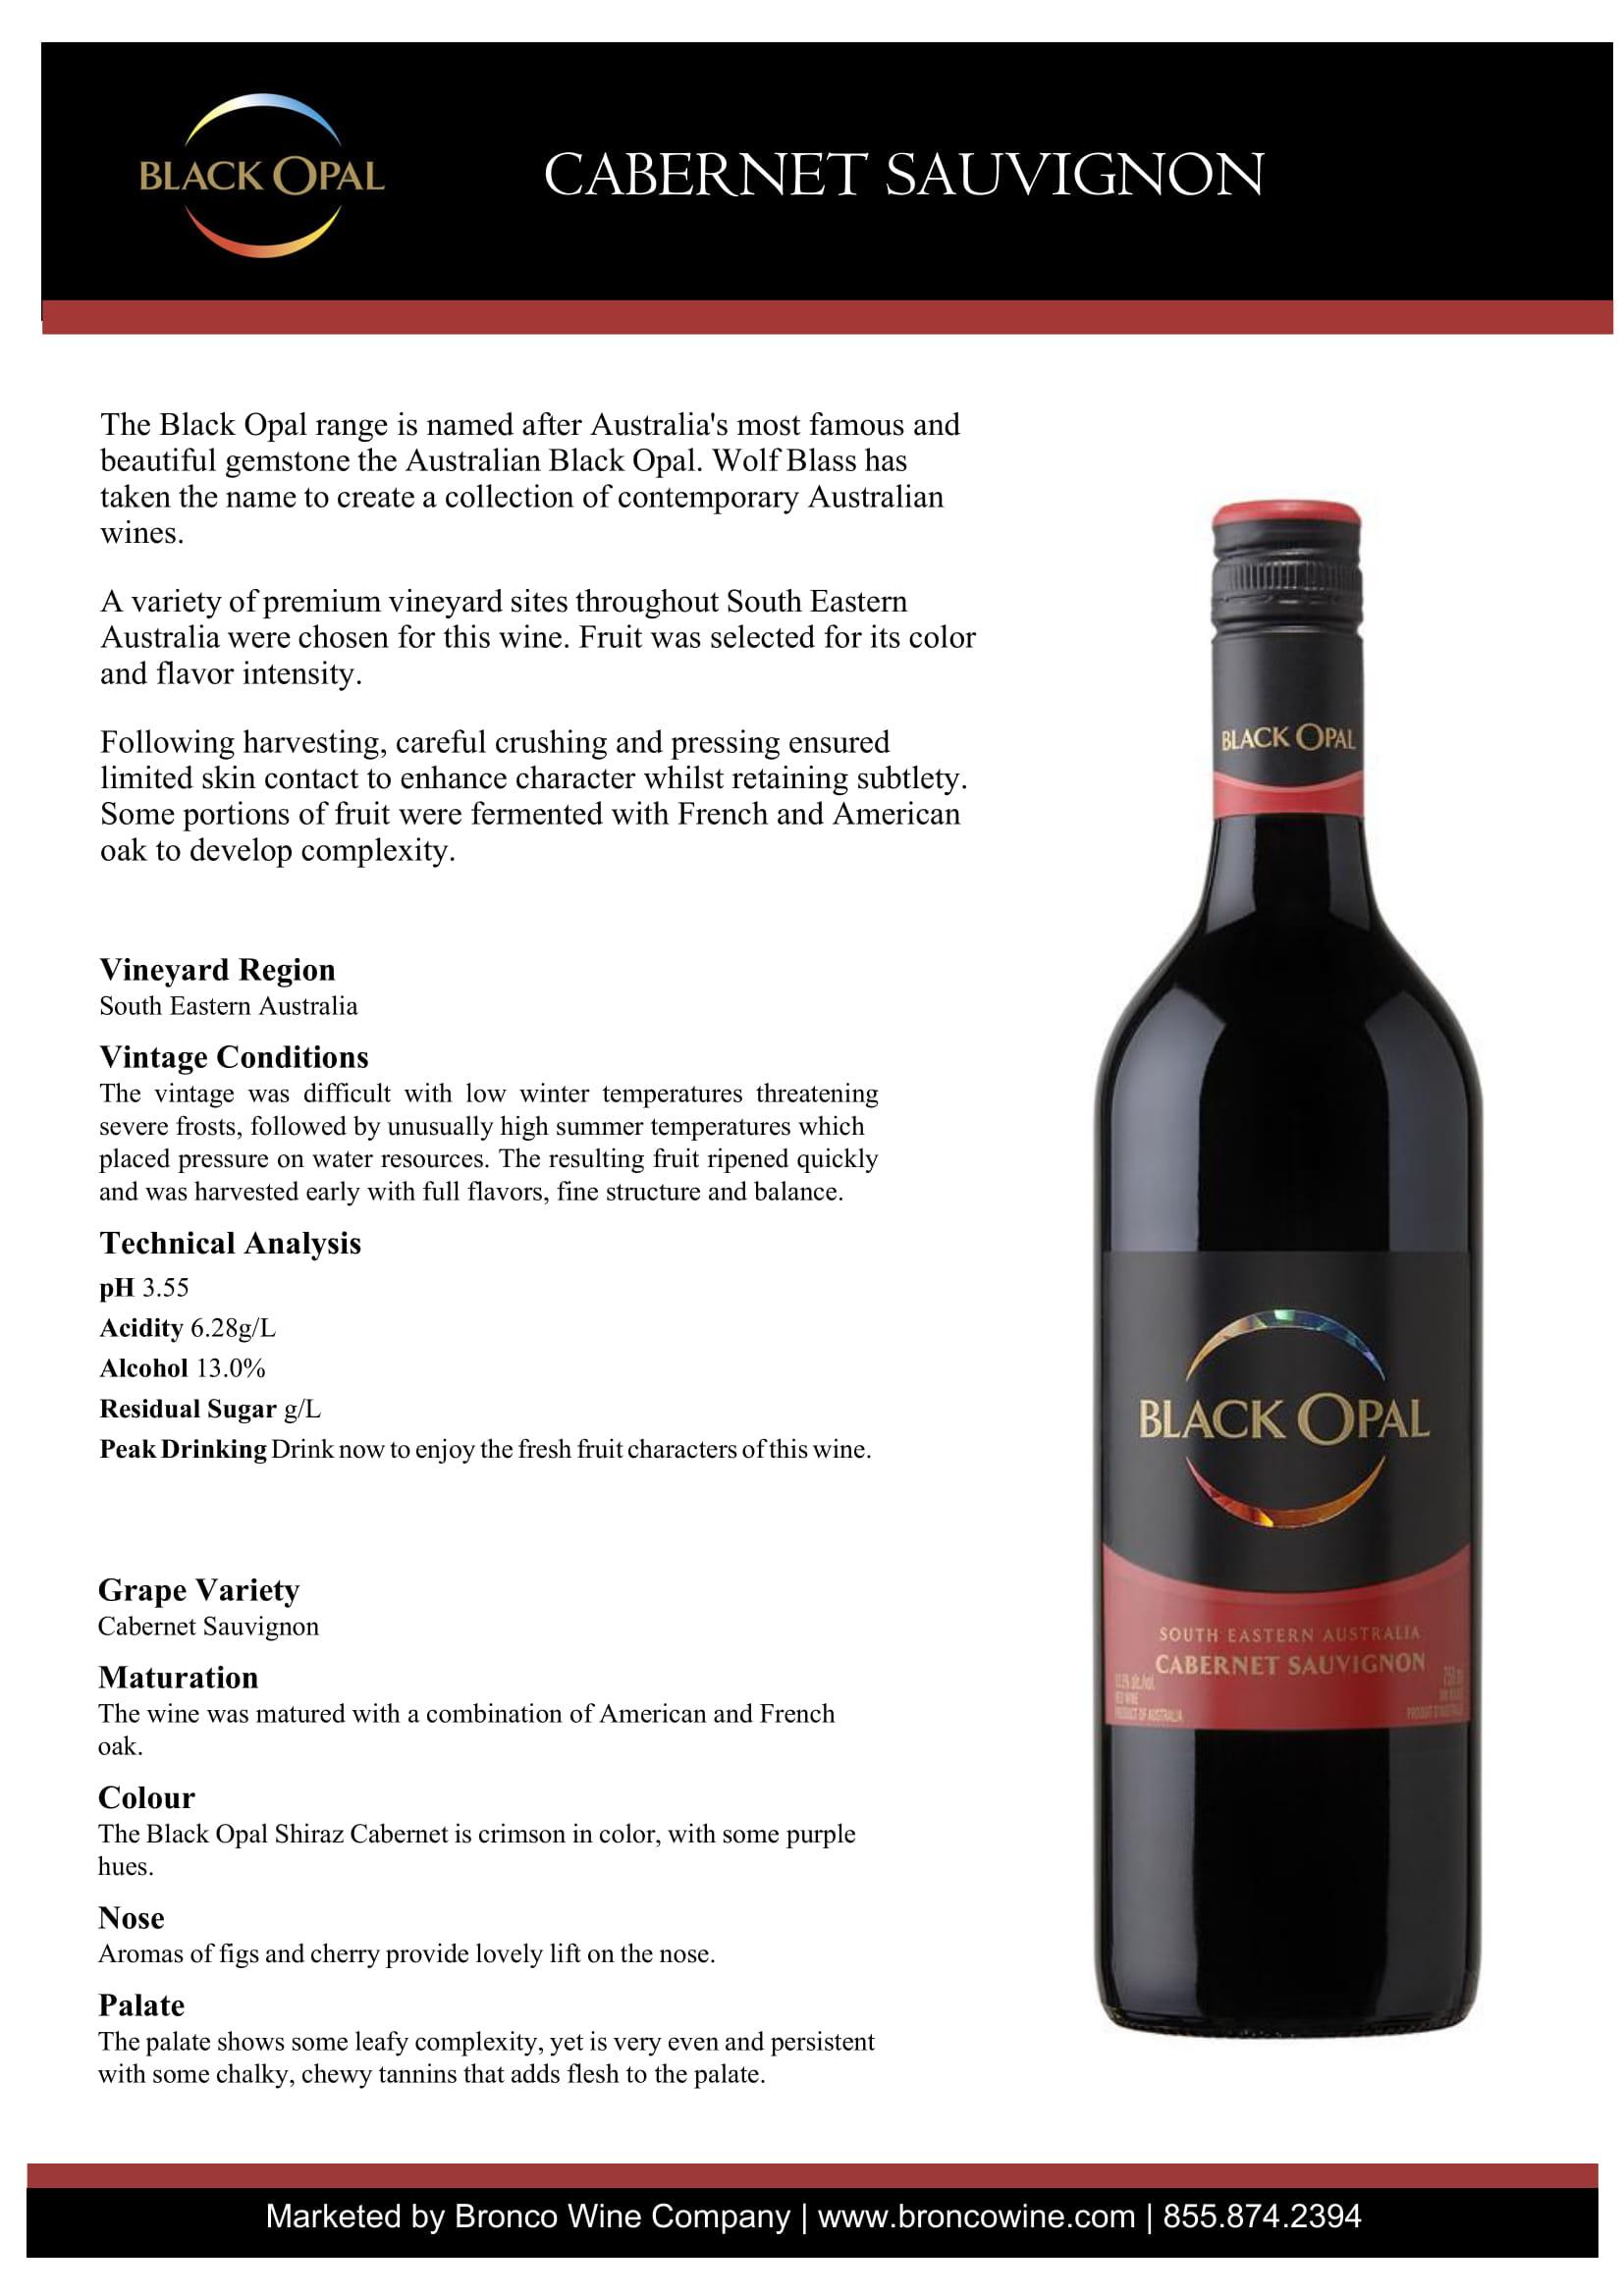 Black Opal Cabernet Sauvignon Tech Sheet